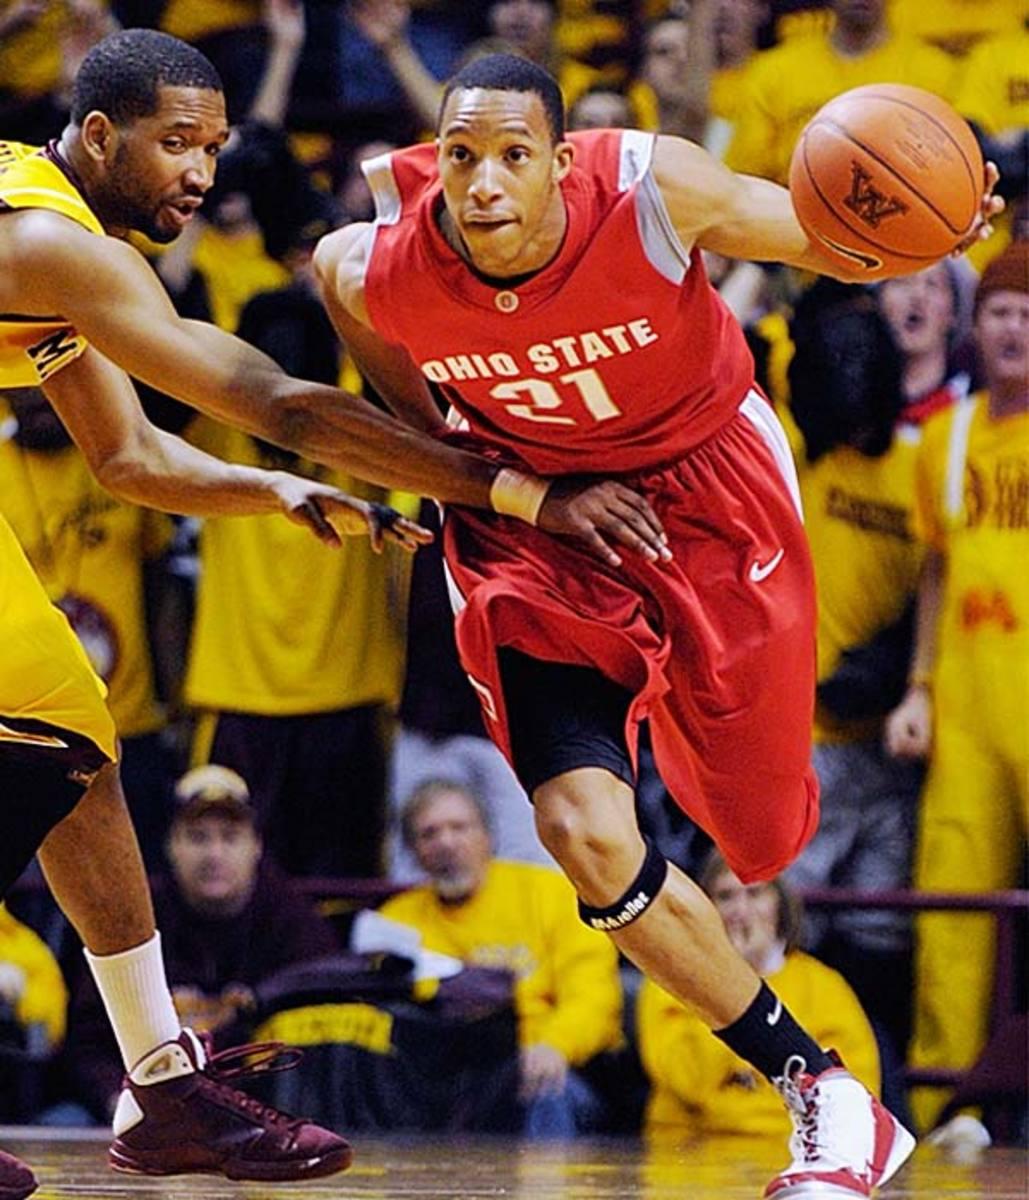 Ohio State at Michigan State, 7 p.m. Tuesday, ESPN 2